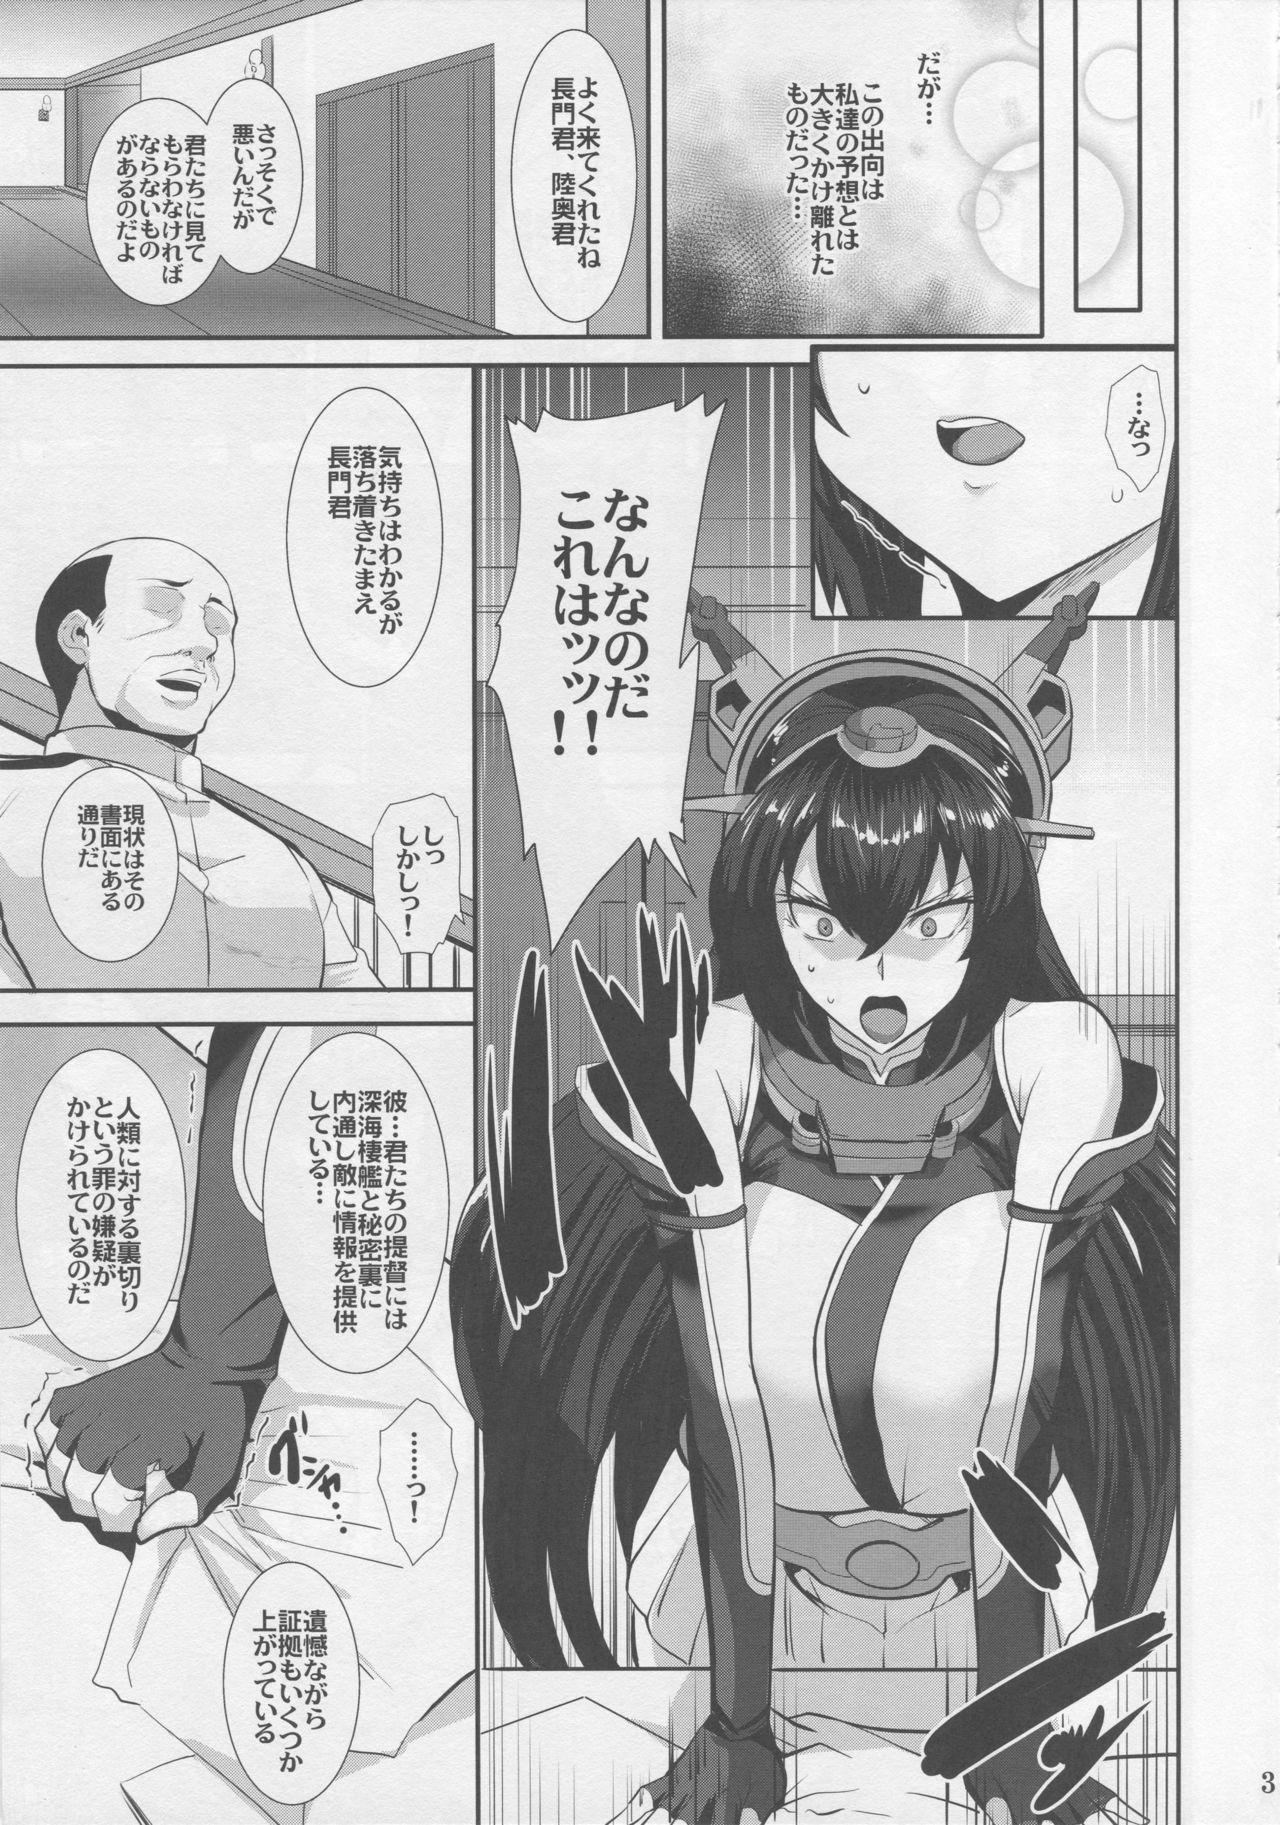 Ochiyuku Shimaikan 3